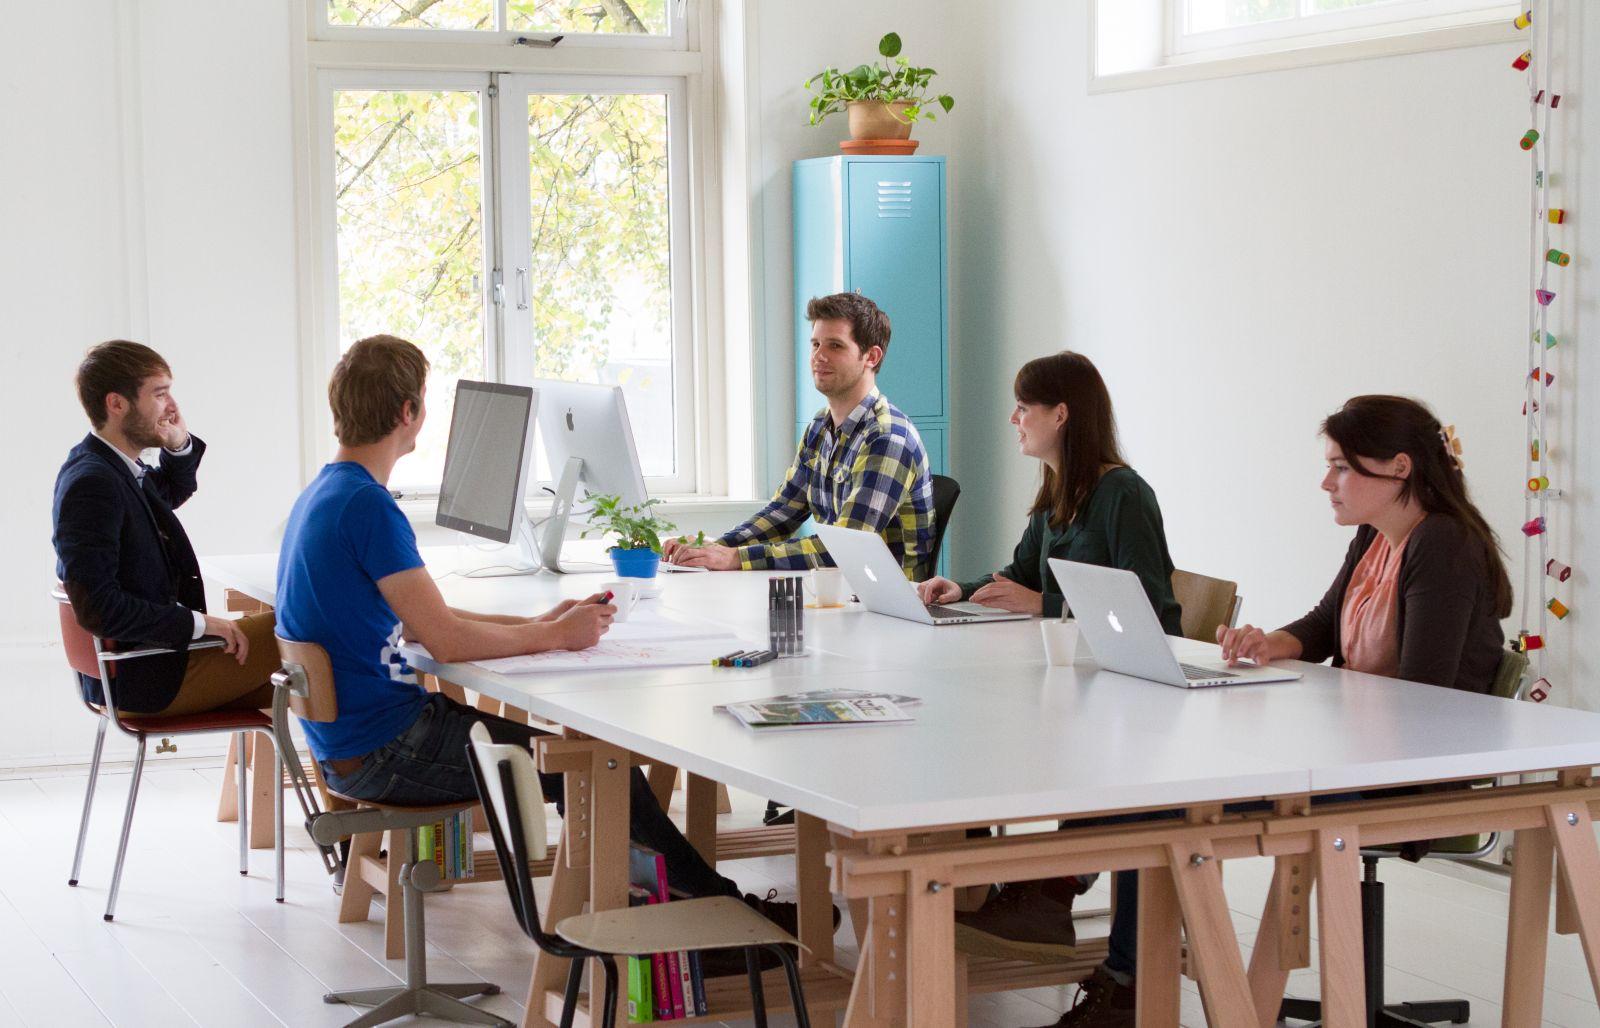 Level Up Coworking, Leeuwarden - Read Reviews & Book Online